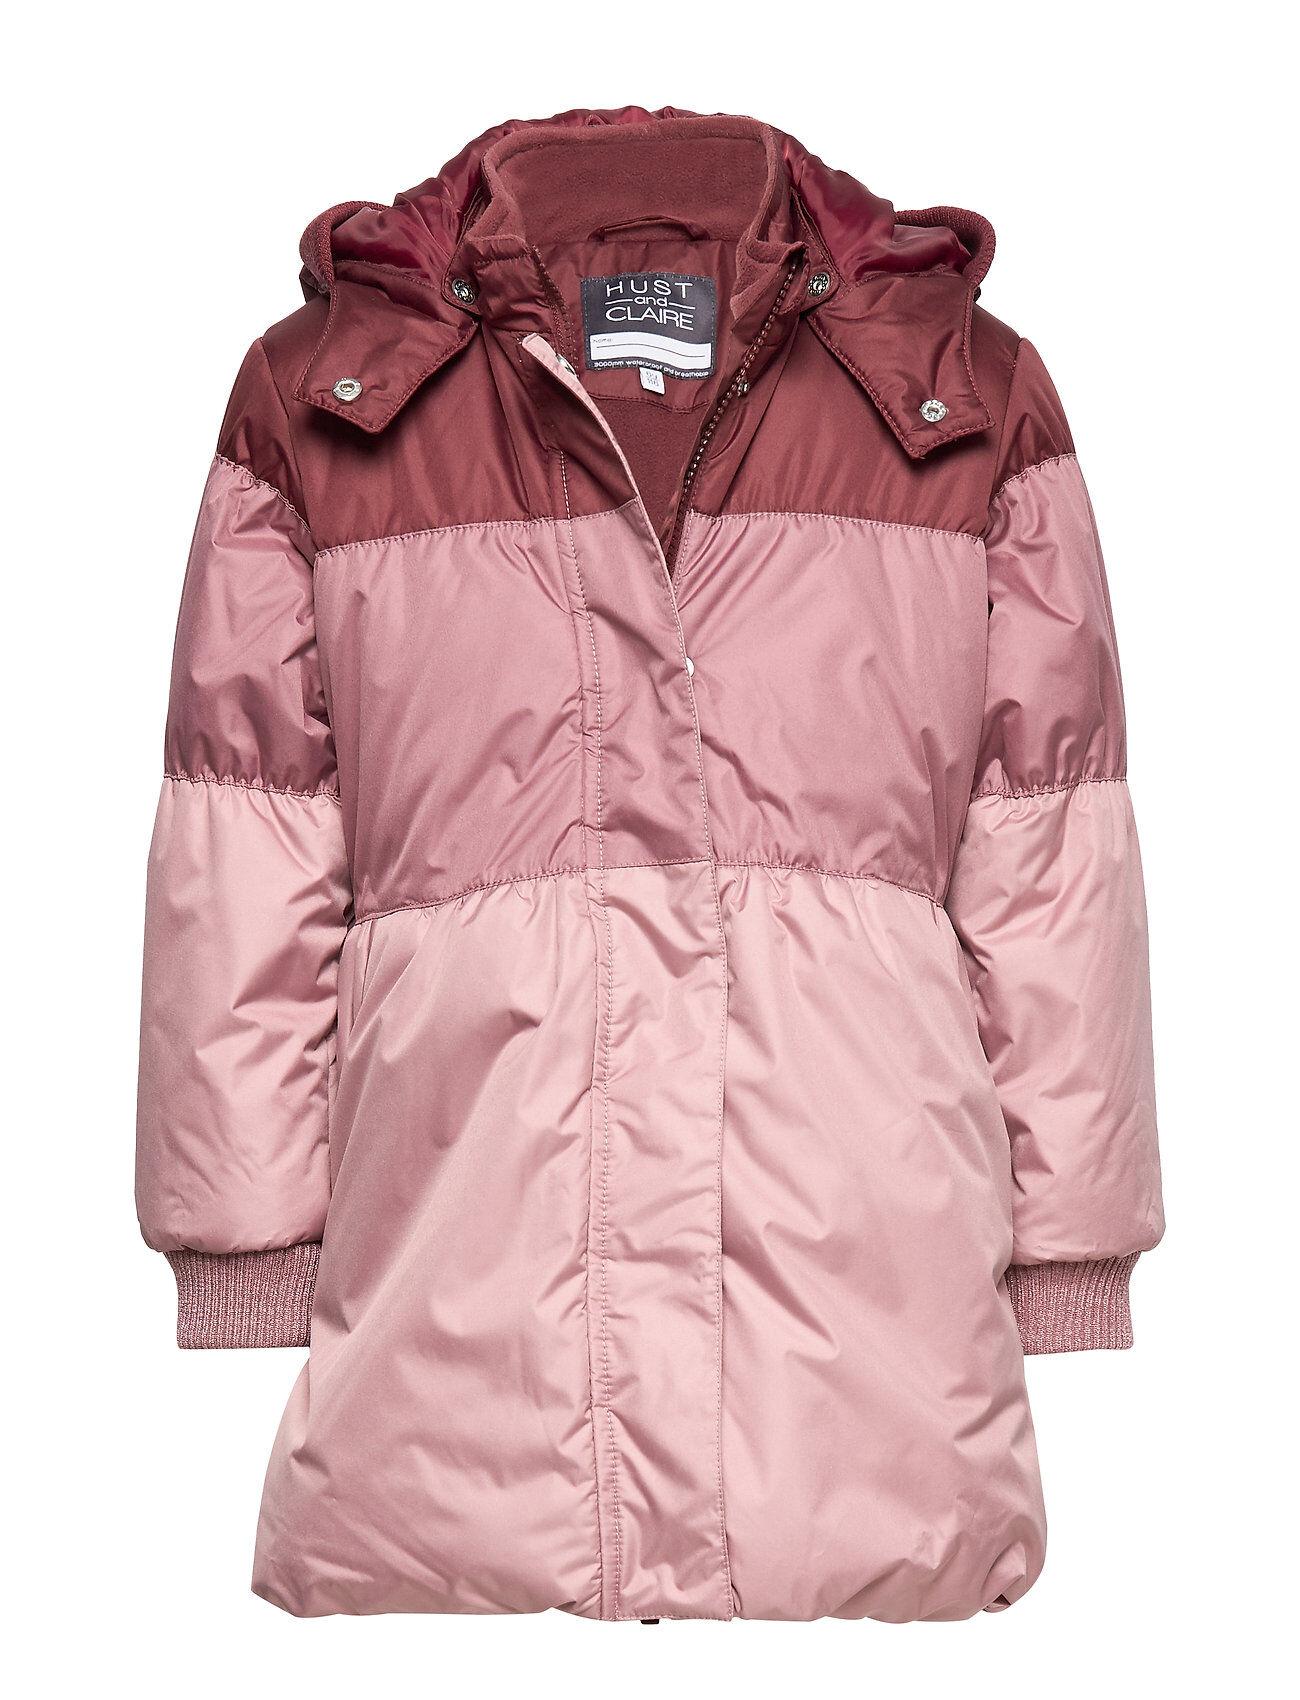 Hust & Claire Oriane - Jacket Toppatakki Vaaleanpunainen Hust & Claire